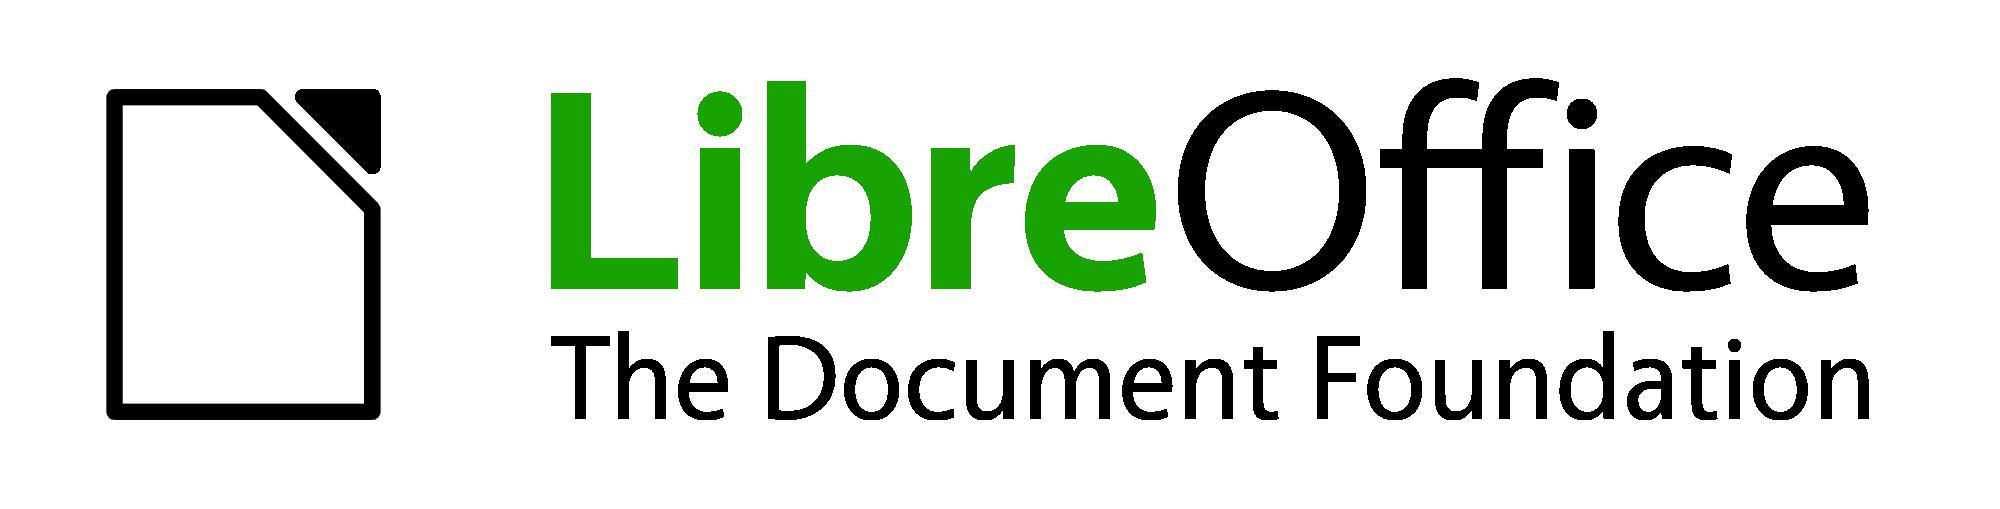 The Document Foundation un año después